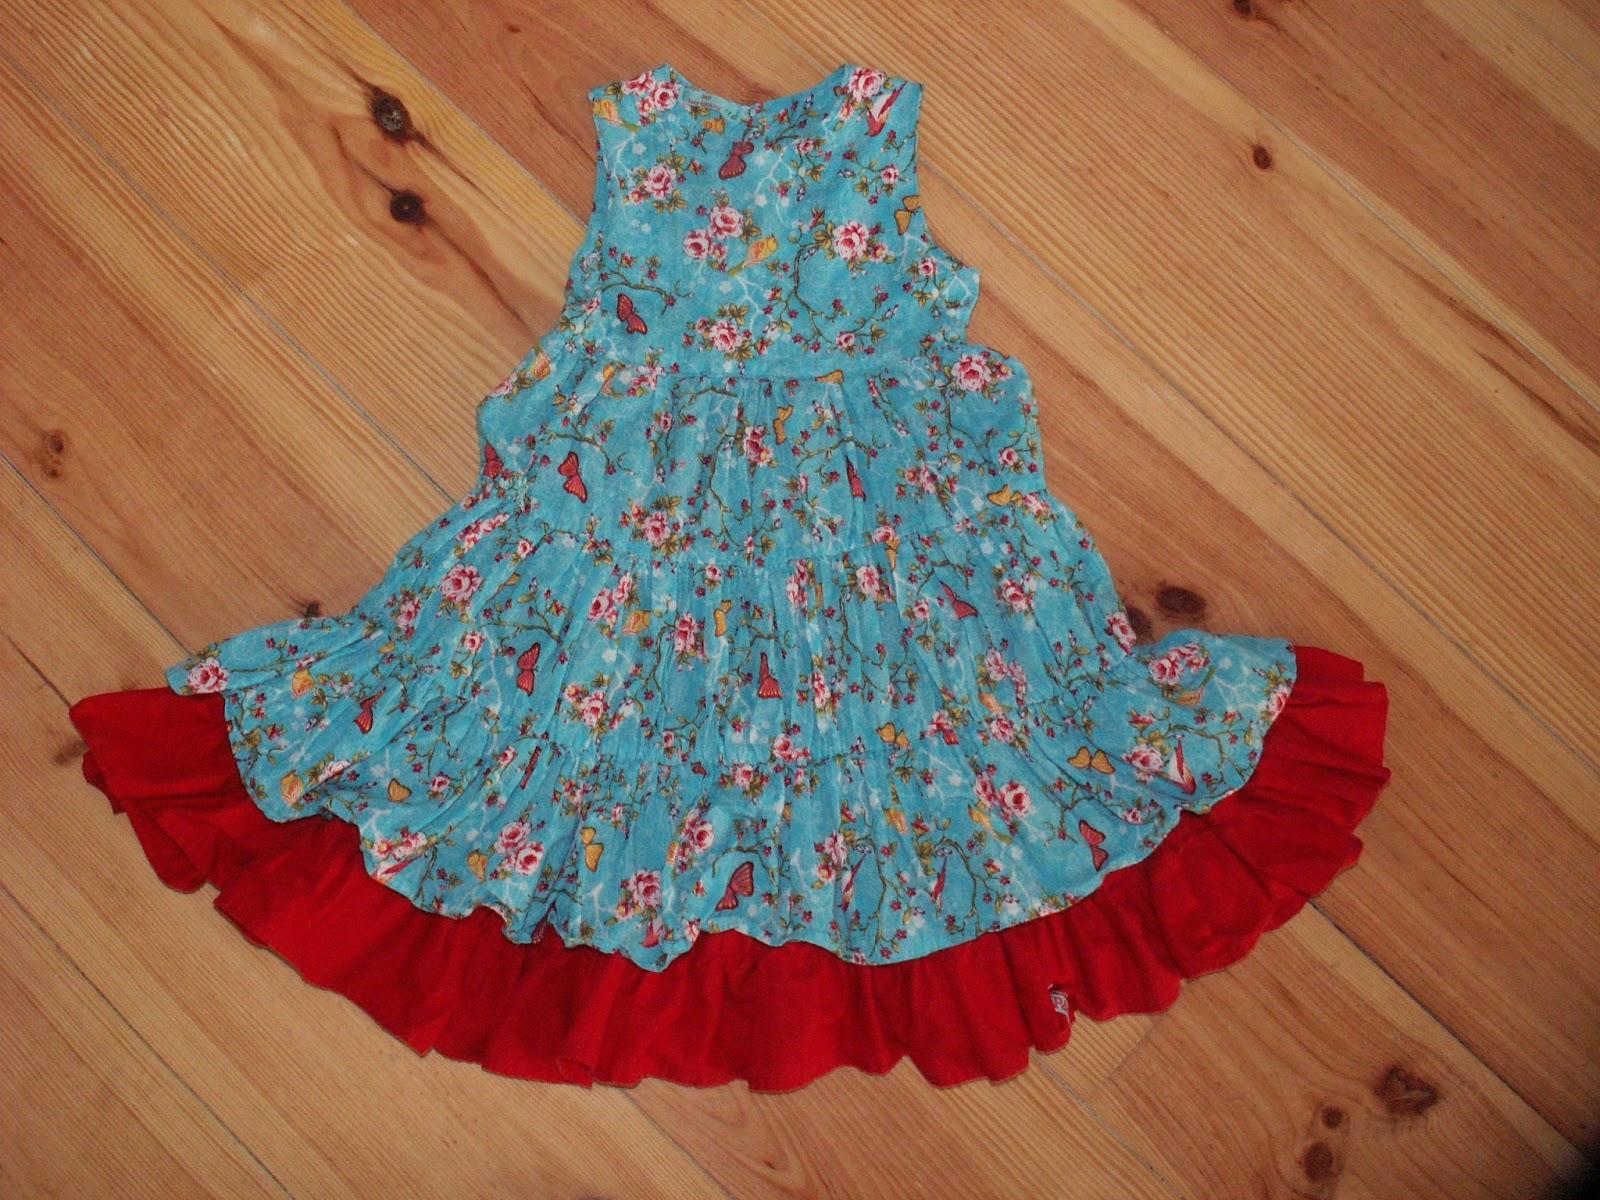 Dress, turqoise, red, butterflies, birds, twirl